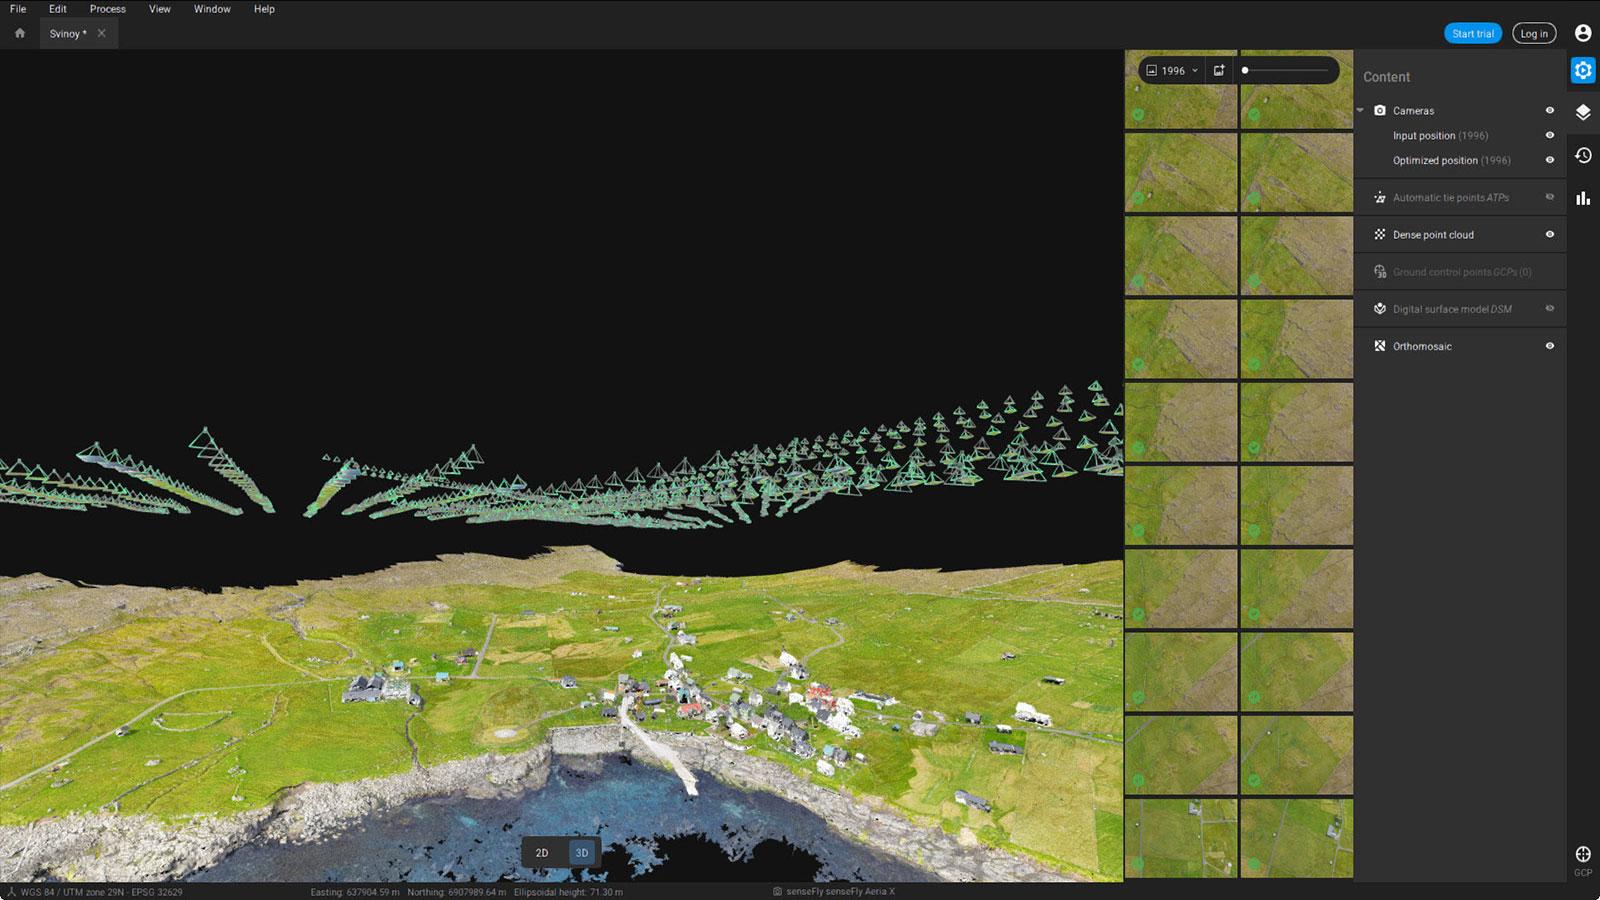 Pix4Dmatic interface of Svinoy island model